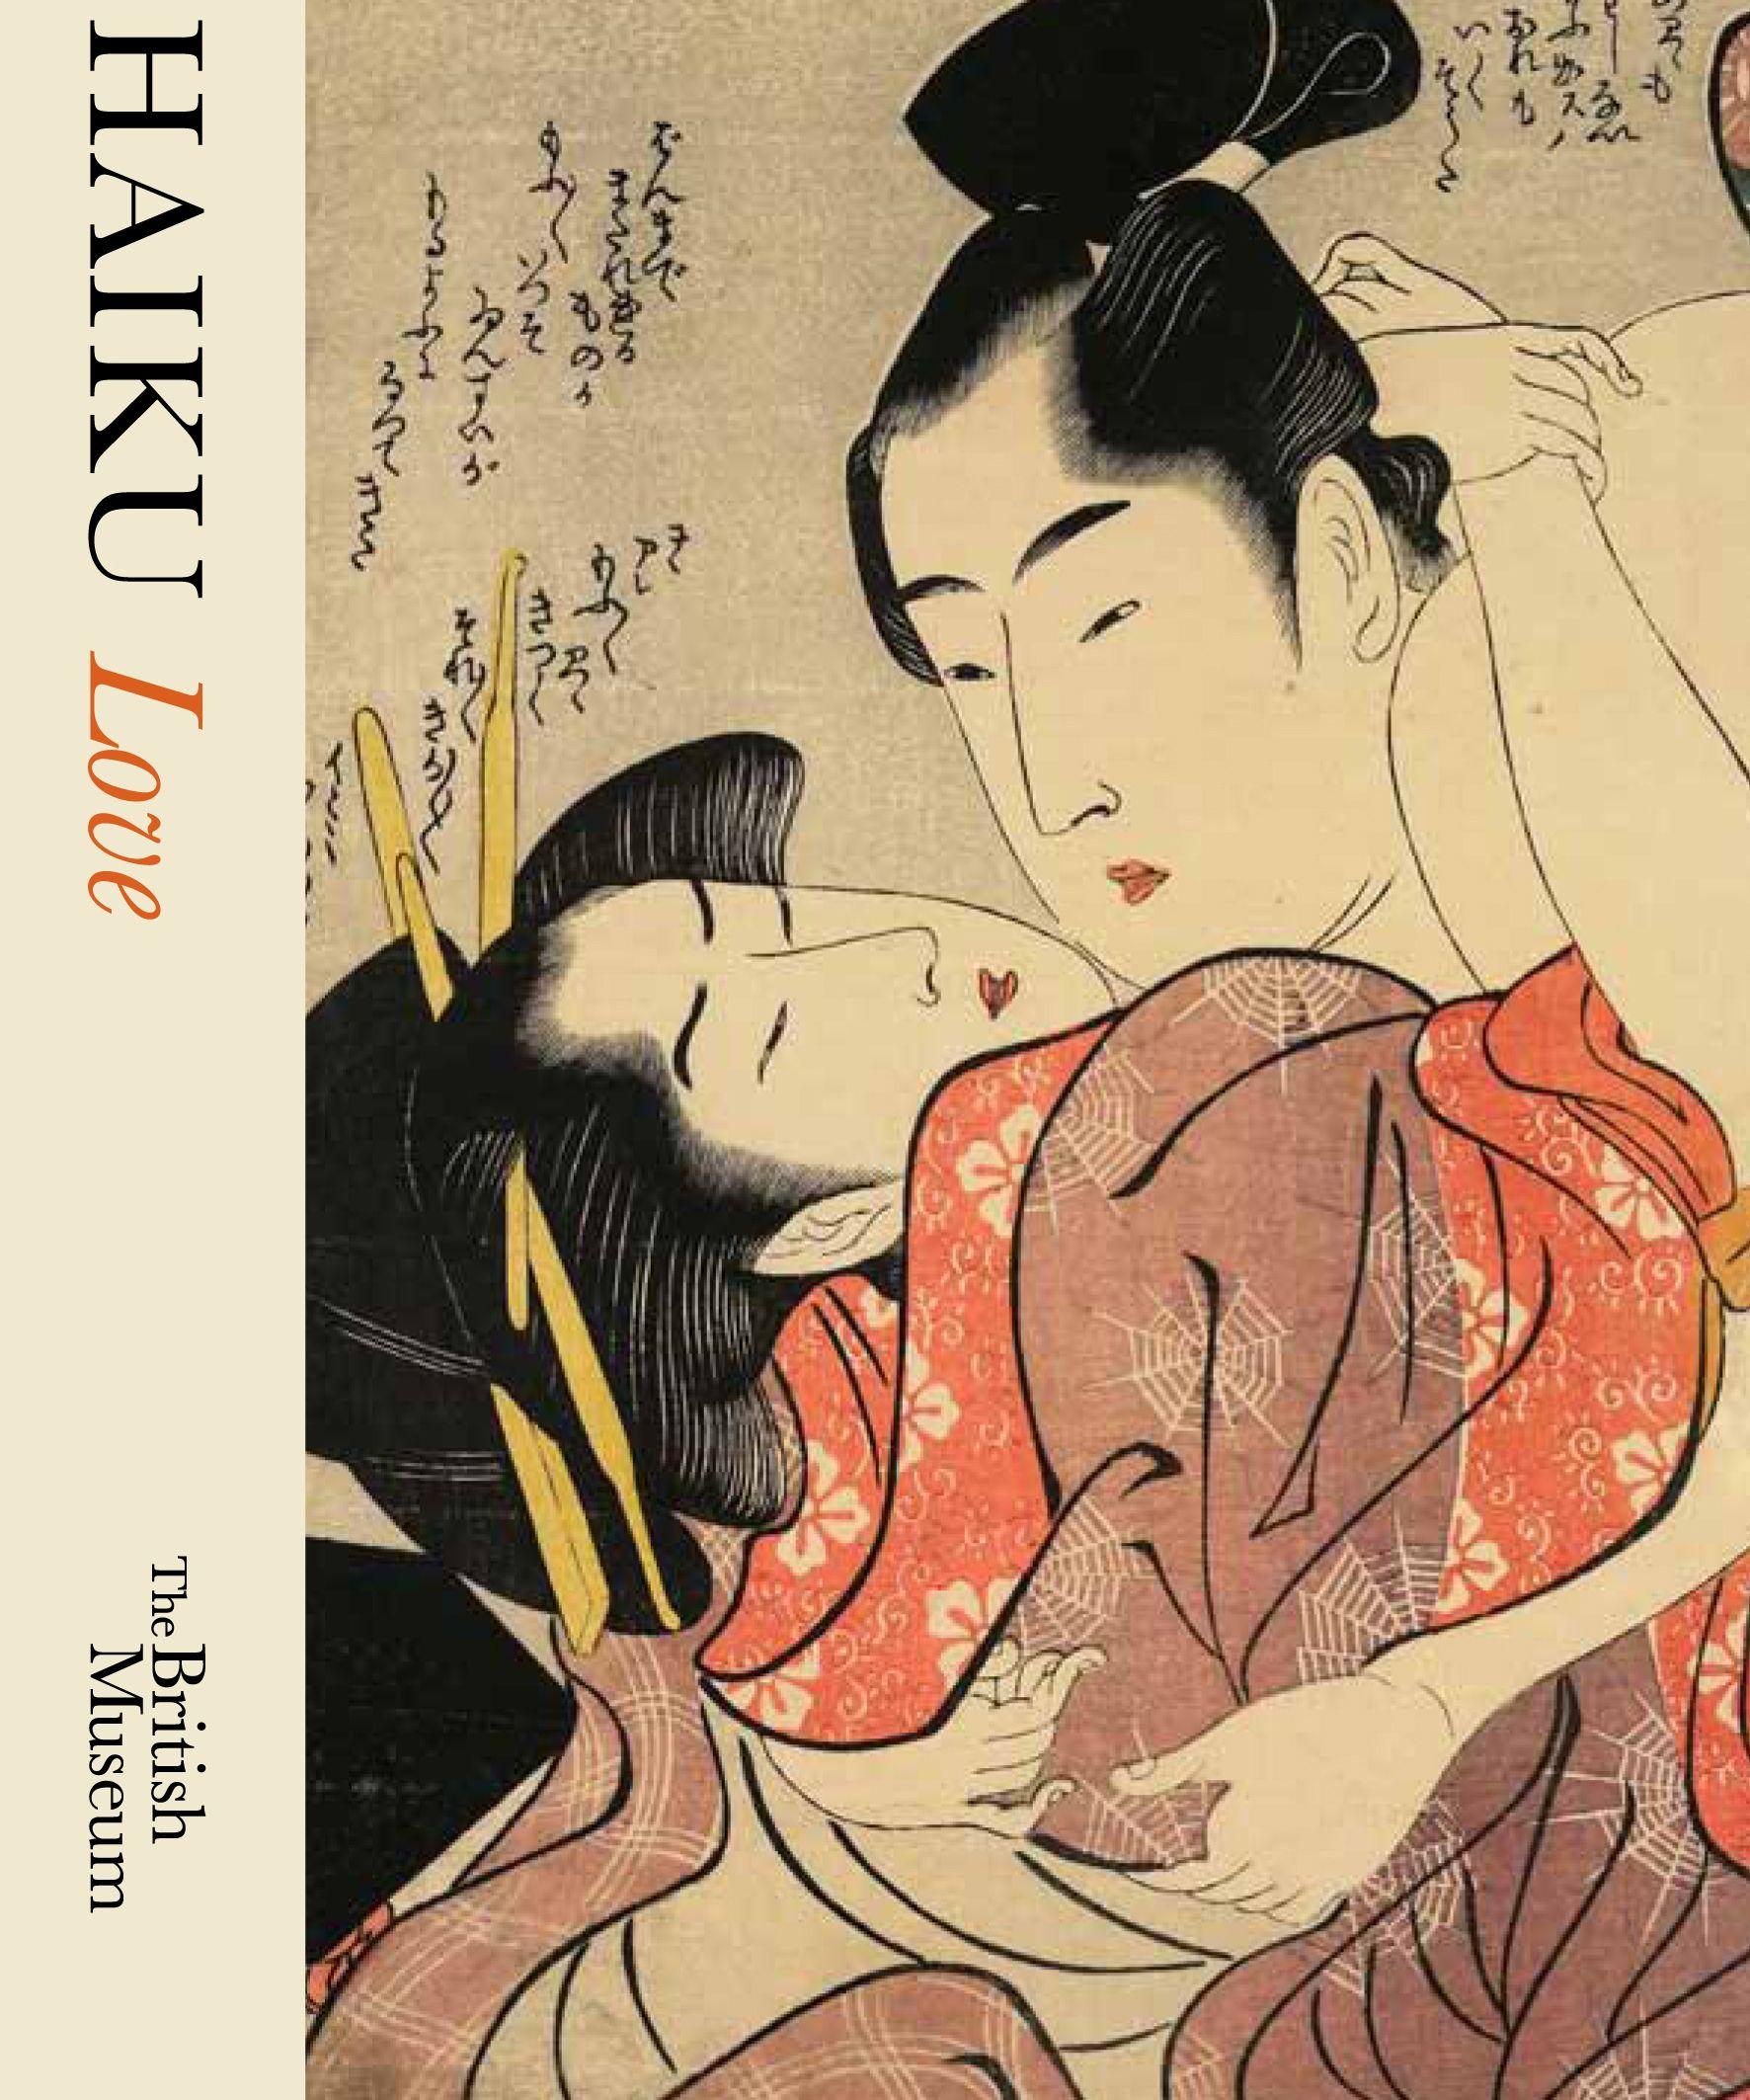 Lesbian sex haiku book